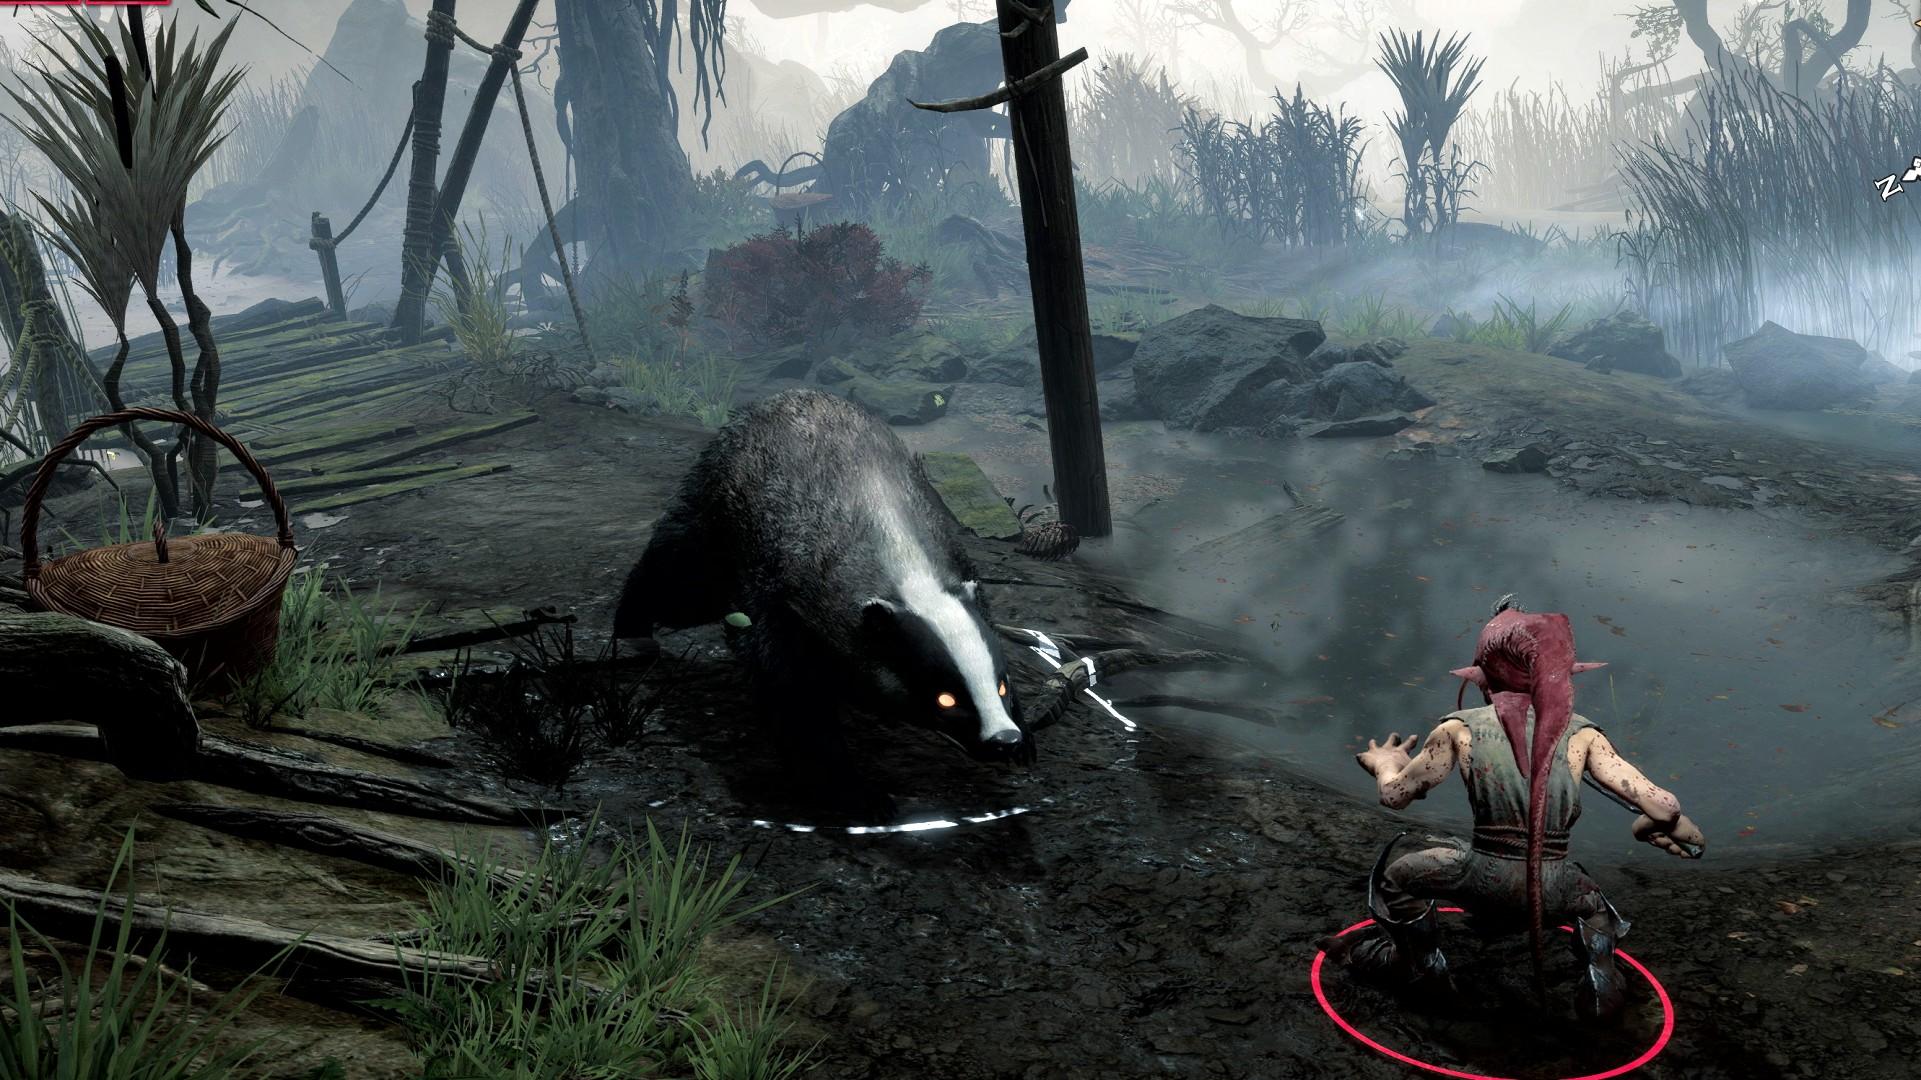 Baldur's Gate 3 is adding druids to its playable character class lineup